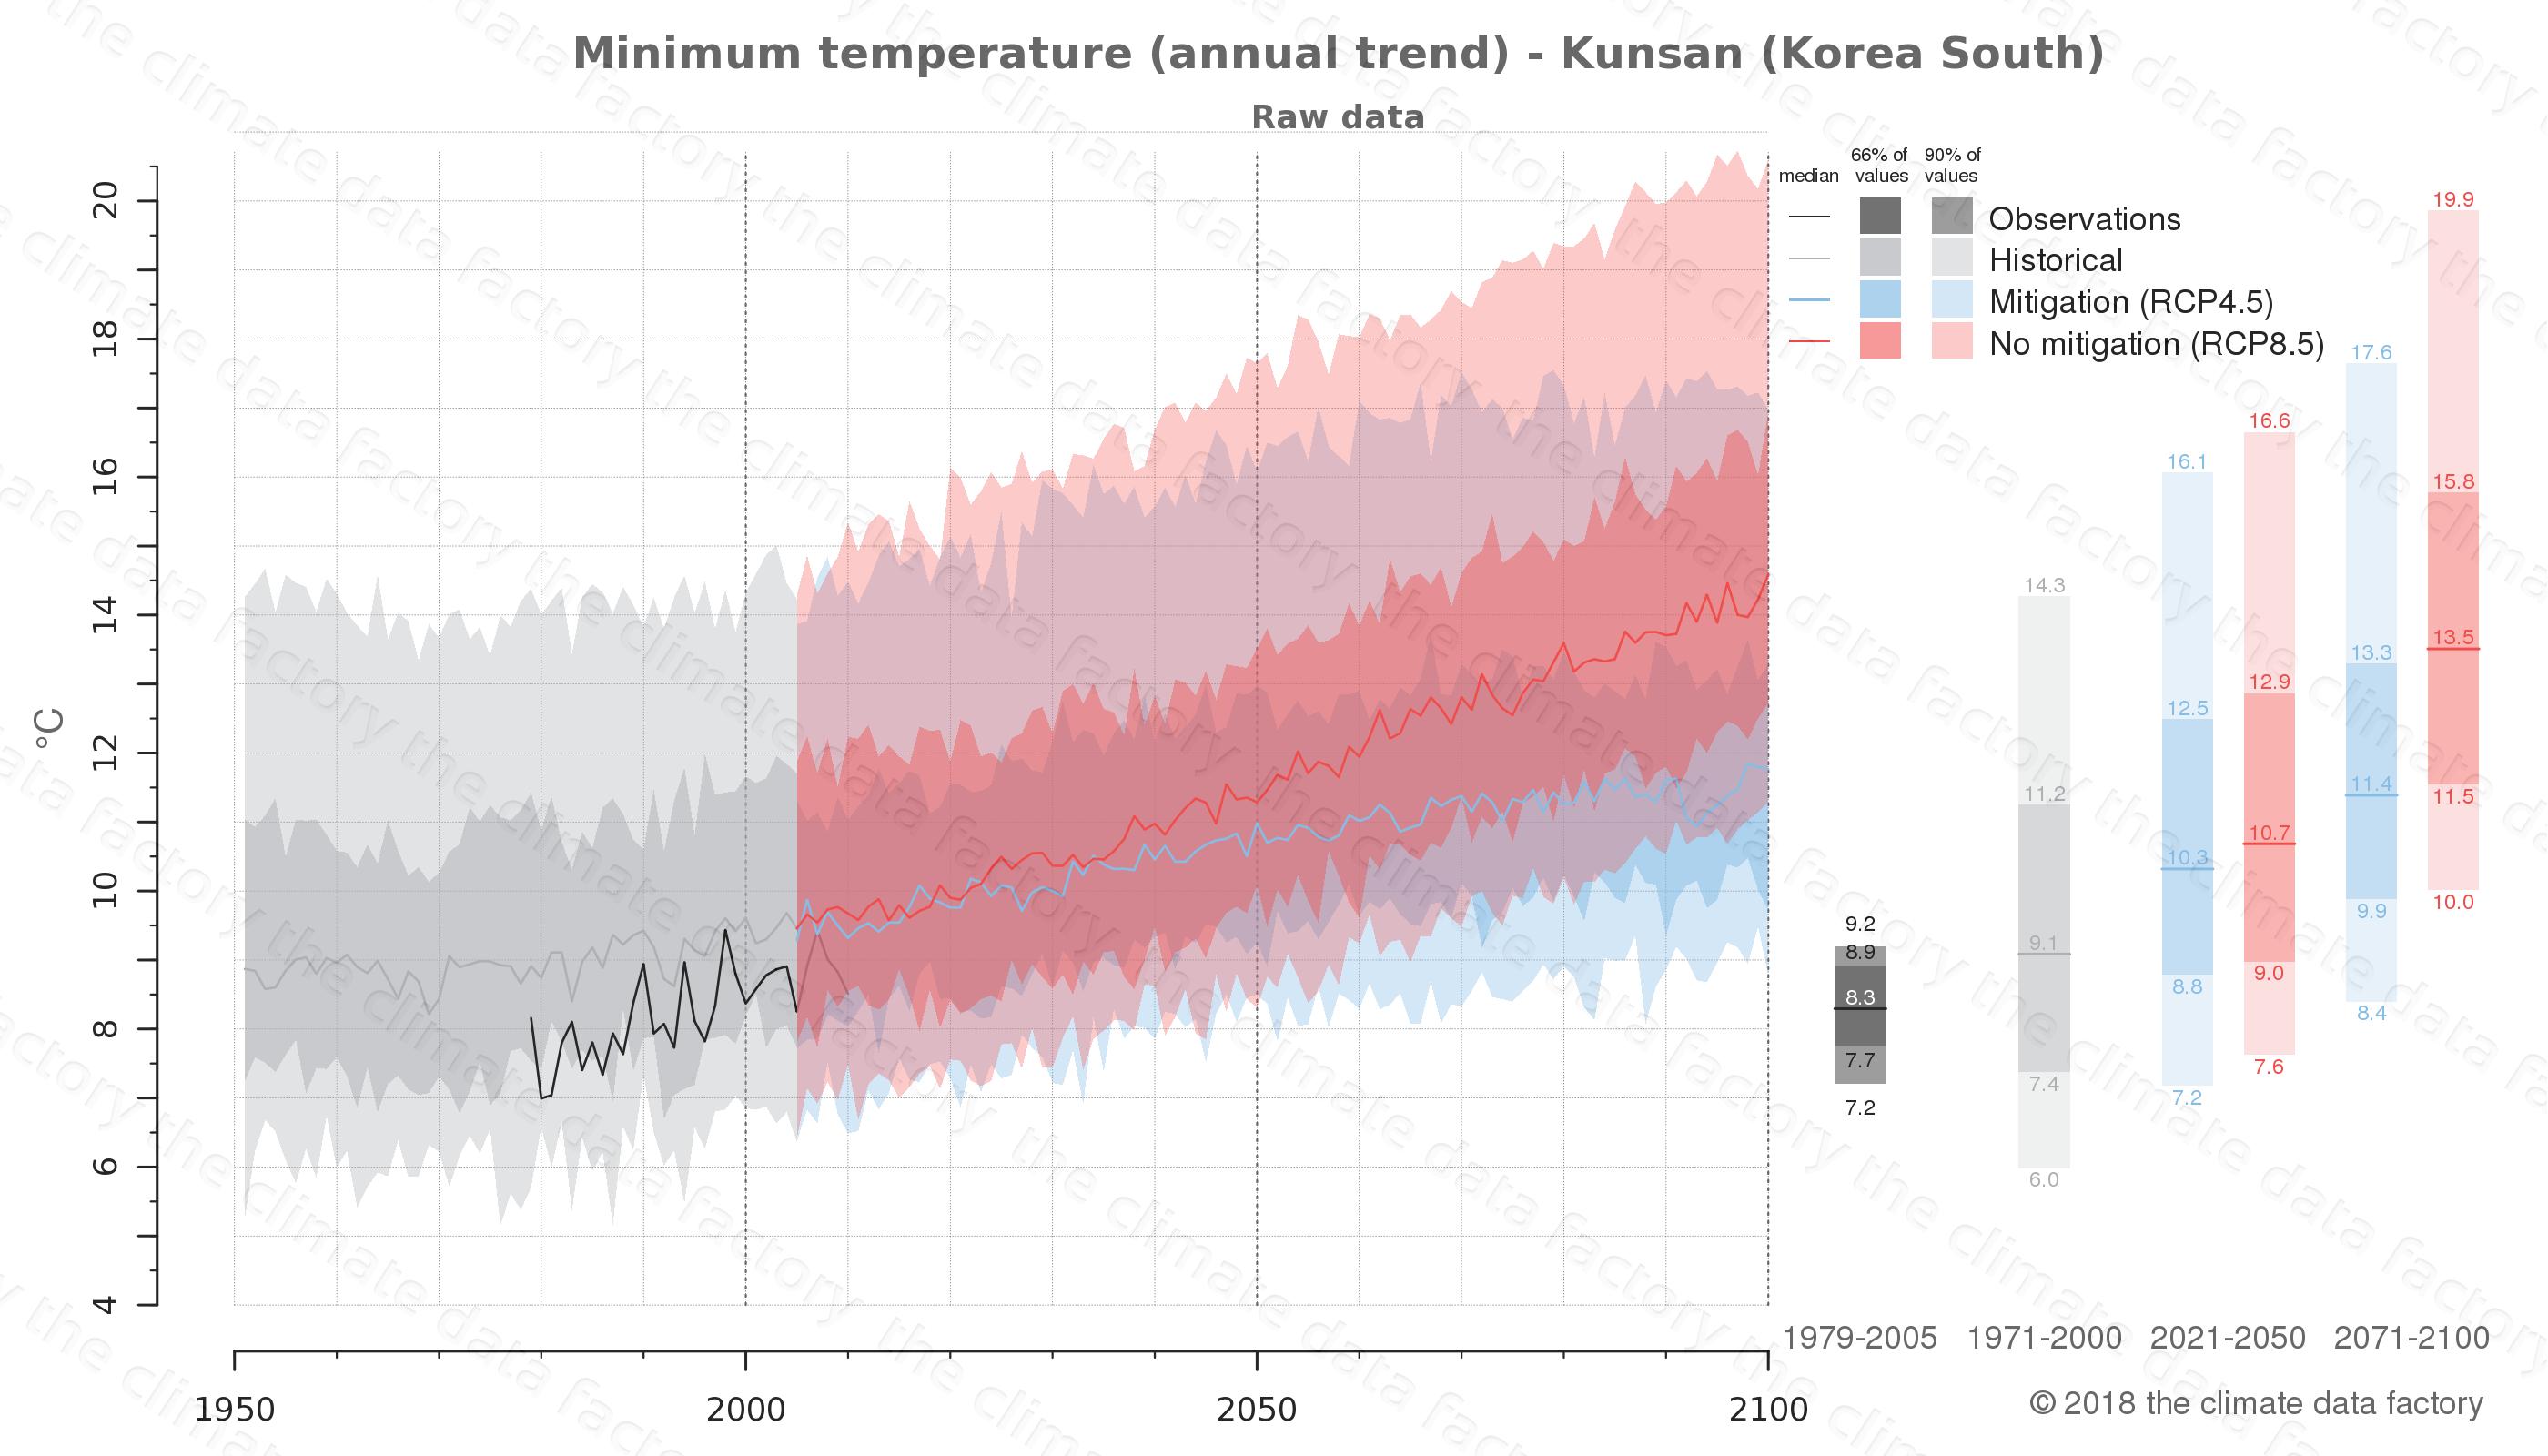 climate change data policy adaptation climate graph city data minimum-temperature kunsan south korea